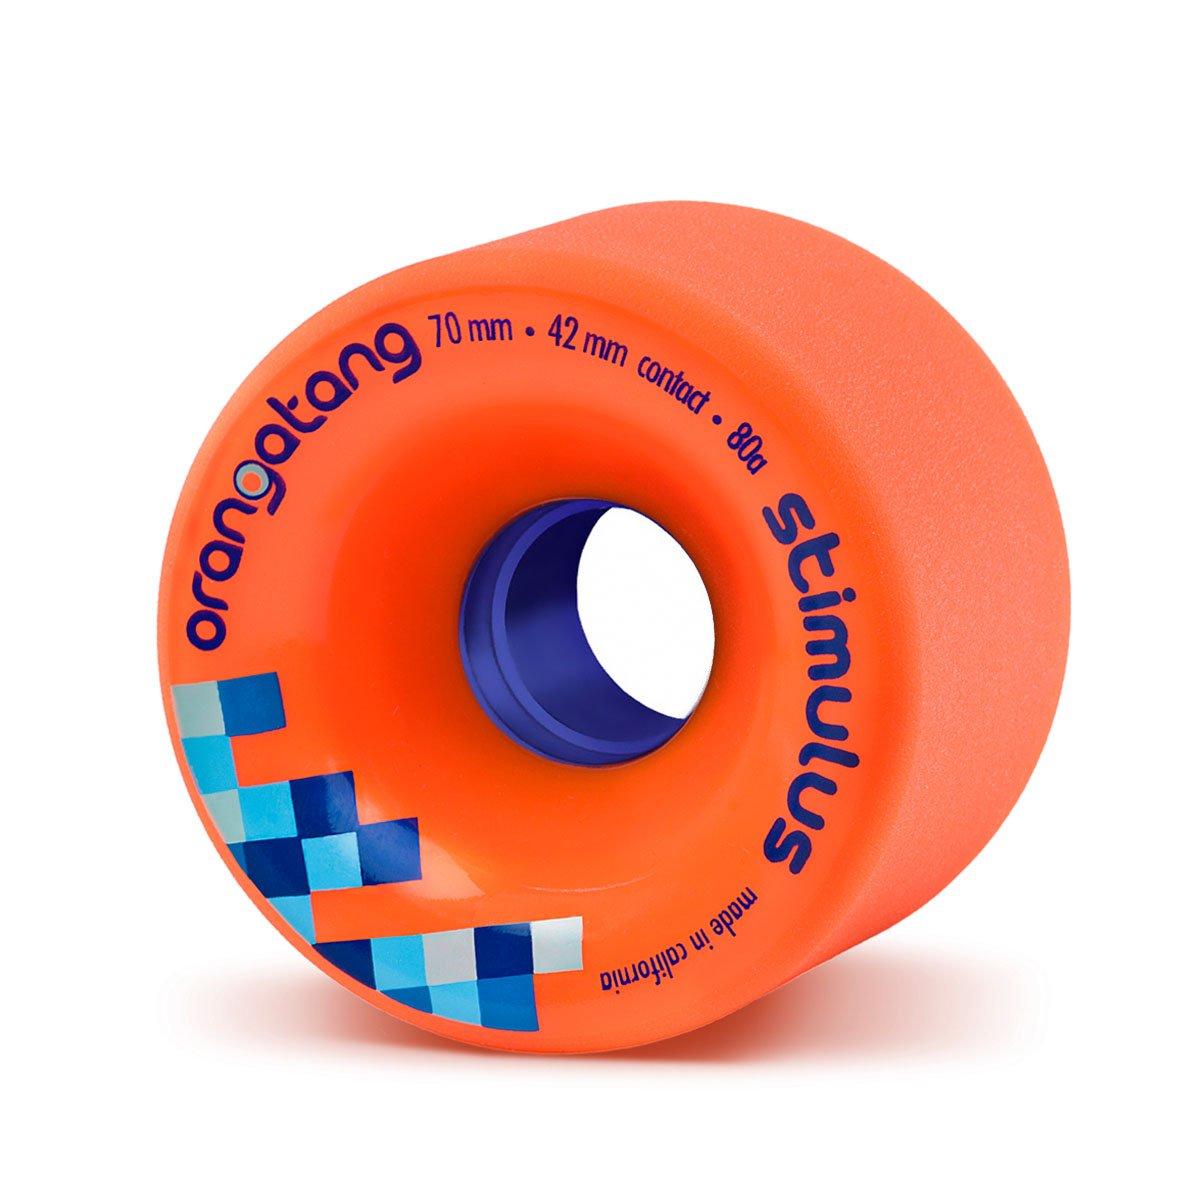 Orangatang Stimulus 70 mm Freeride Longboard Skateboard Wheels